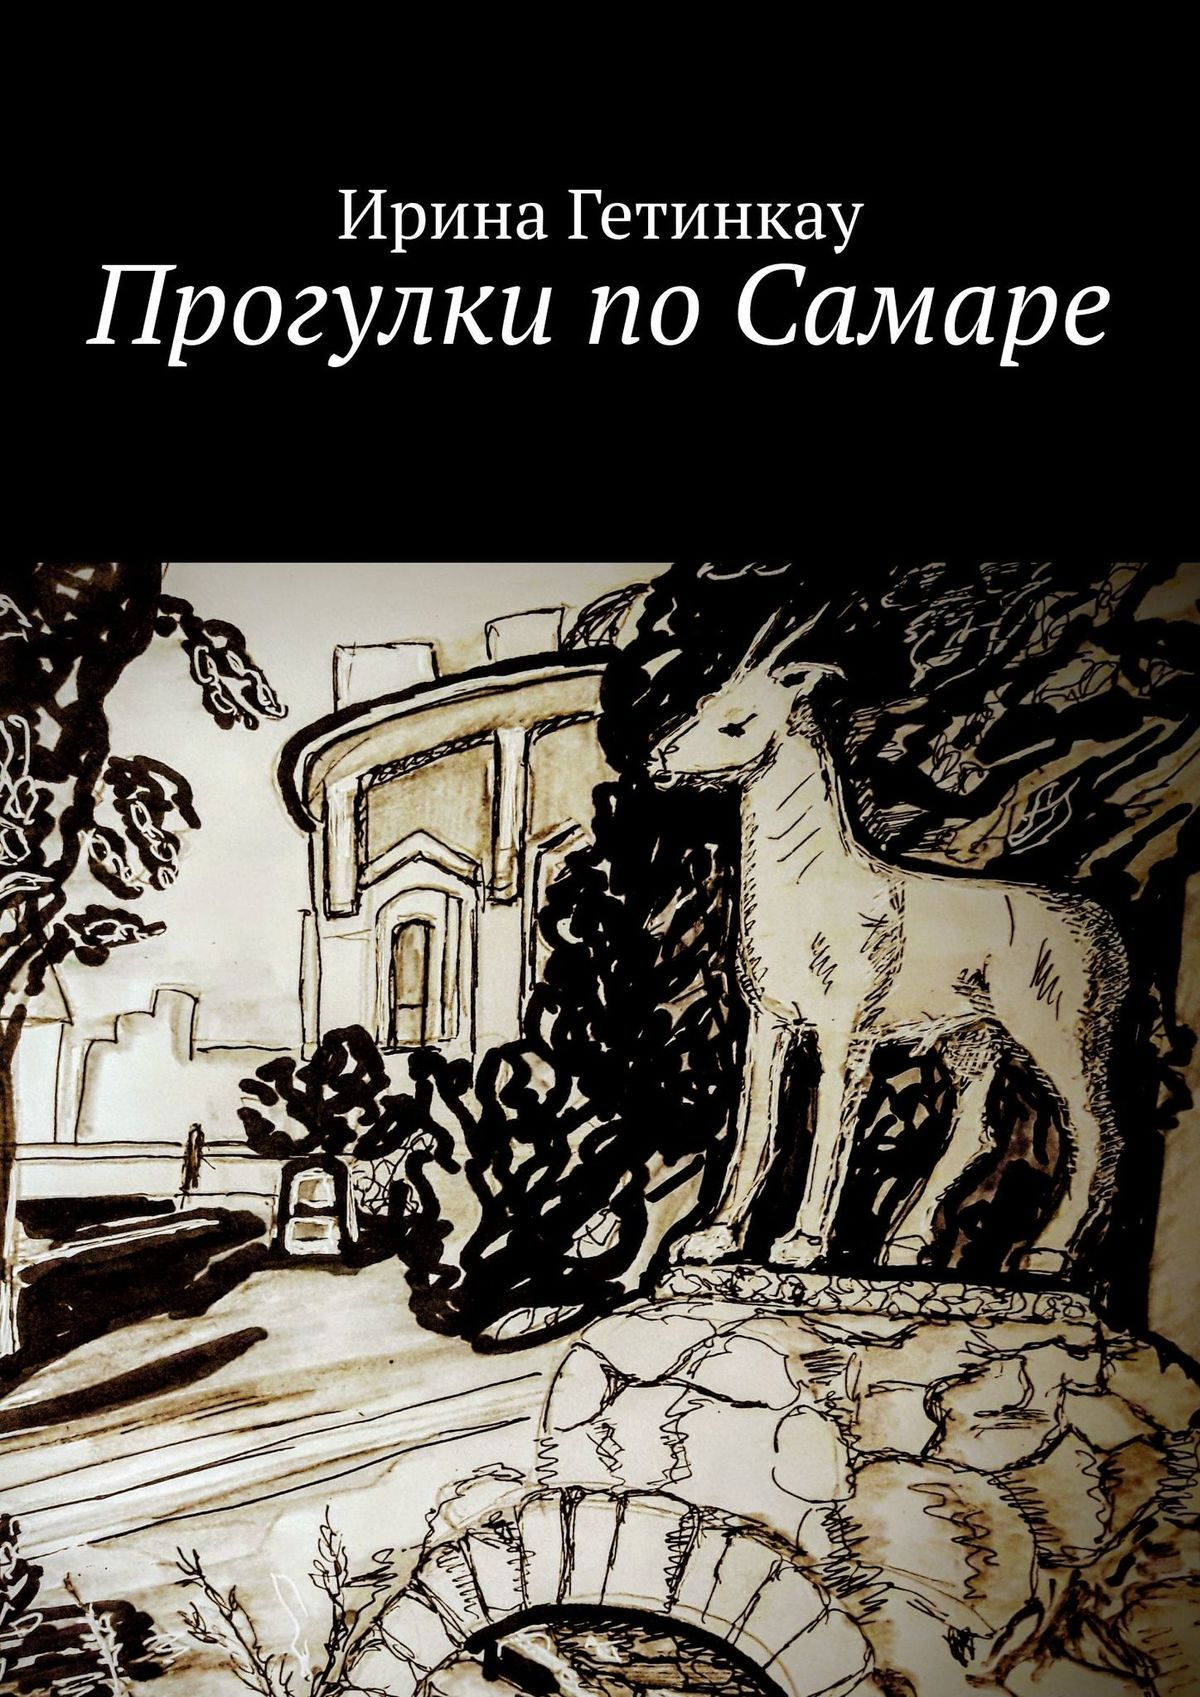 Ирина Викторовна Гетинкау Прогулки по Самаре